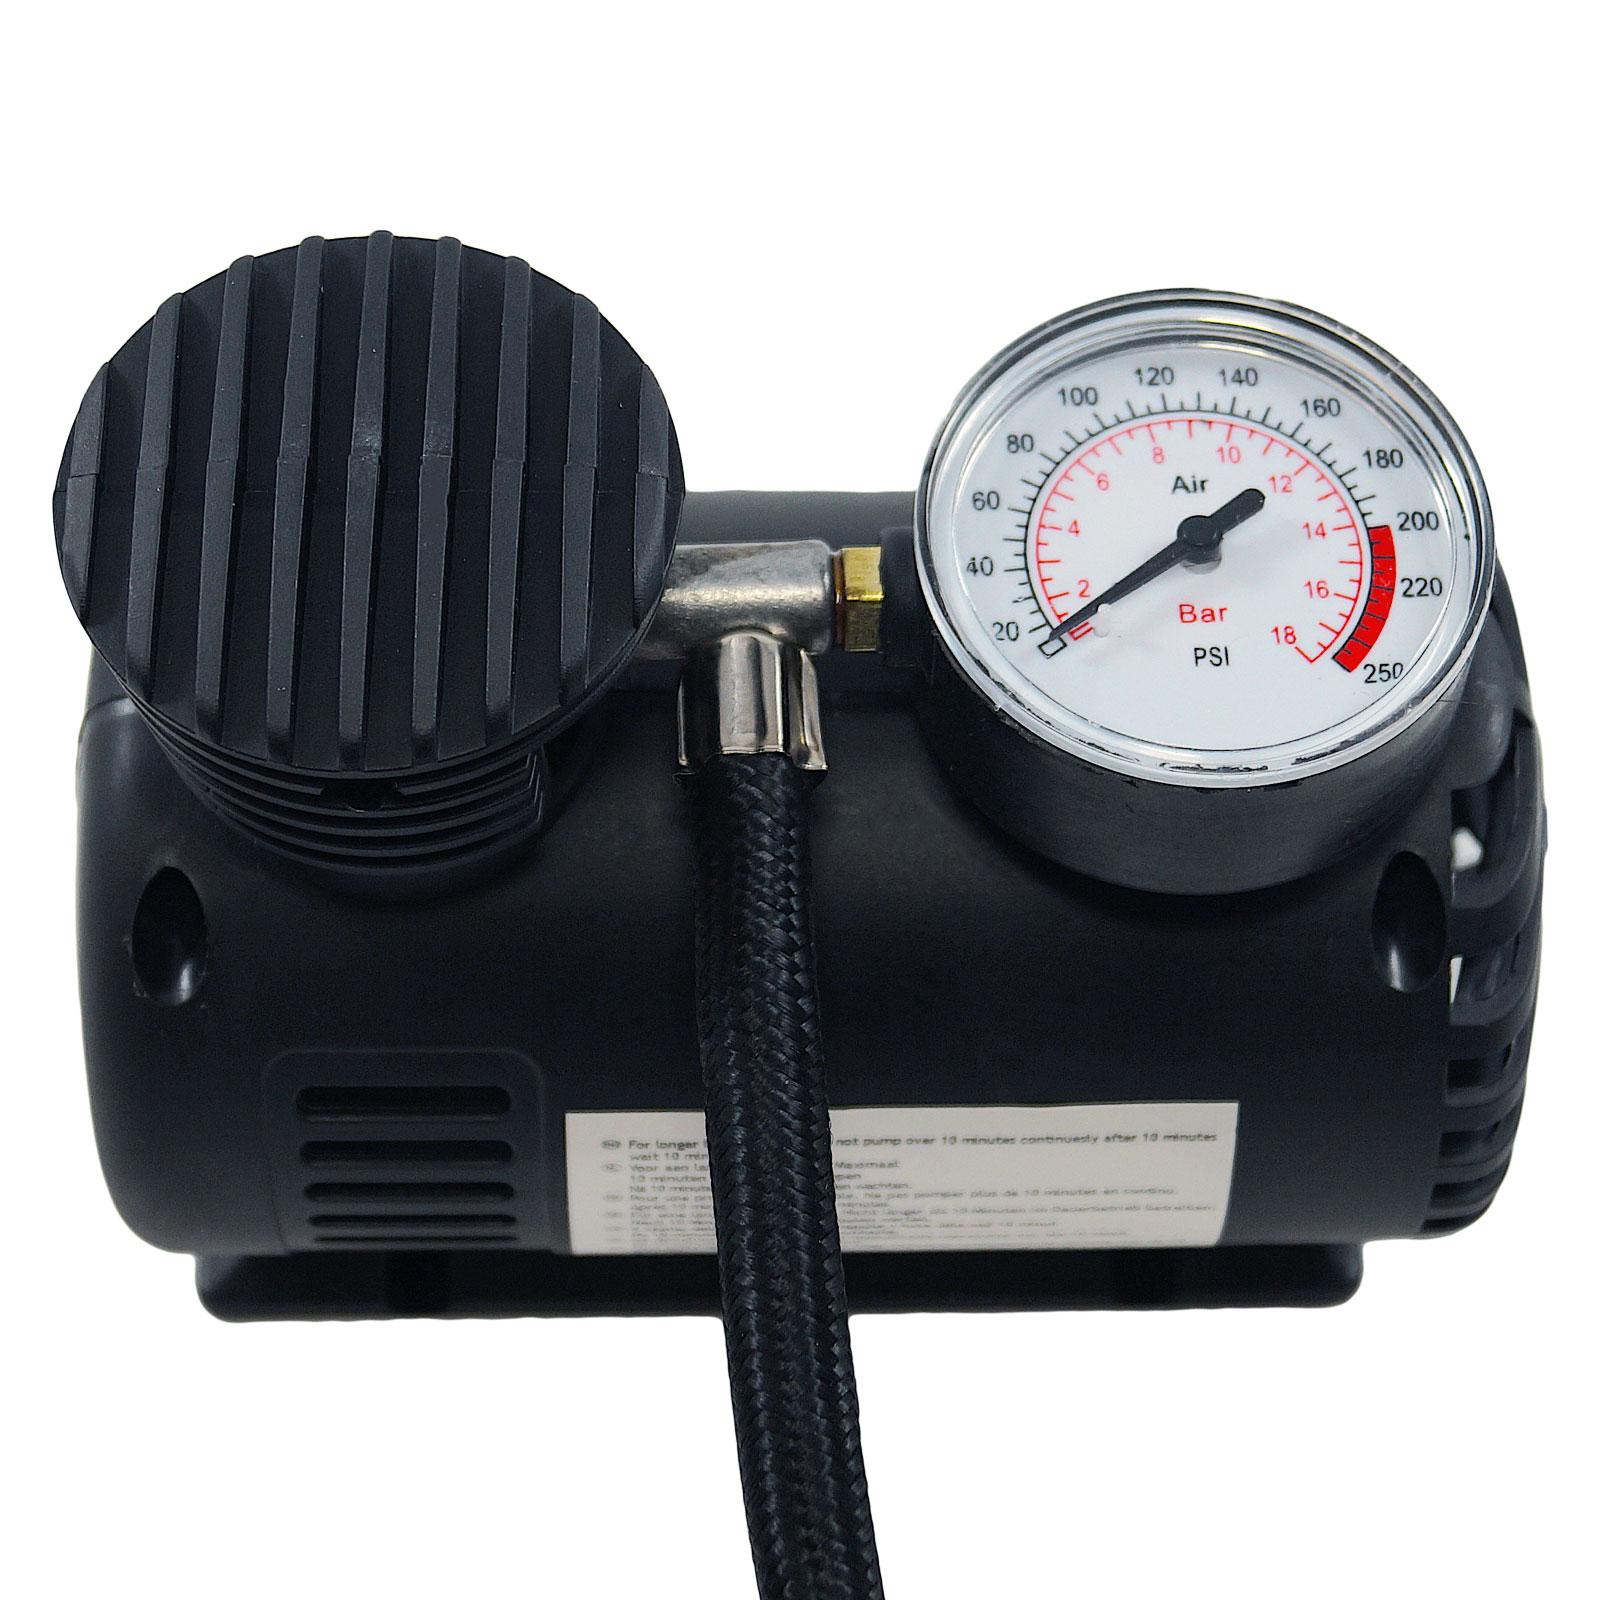 12 Volt Minikompressor, 17 Bar, 10 min. Dauerbetrieb, 2,85m Kabellänge